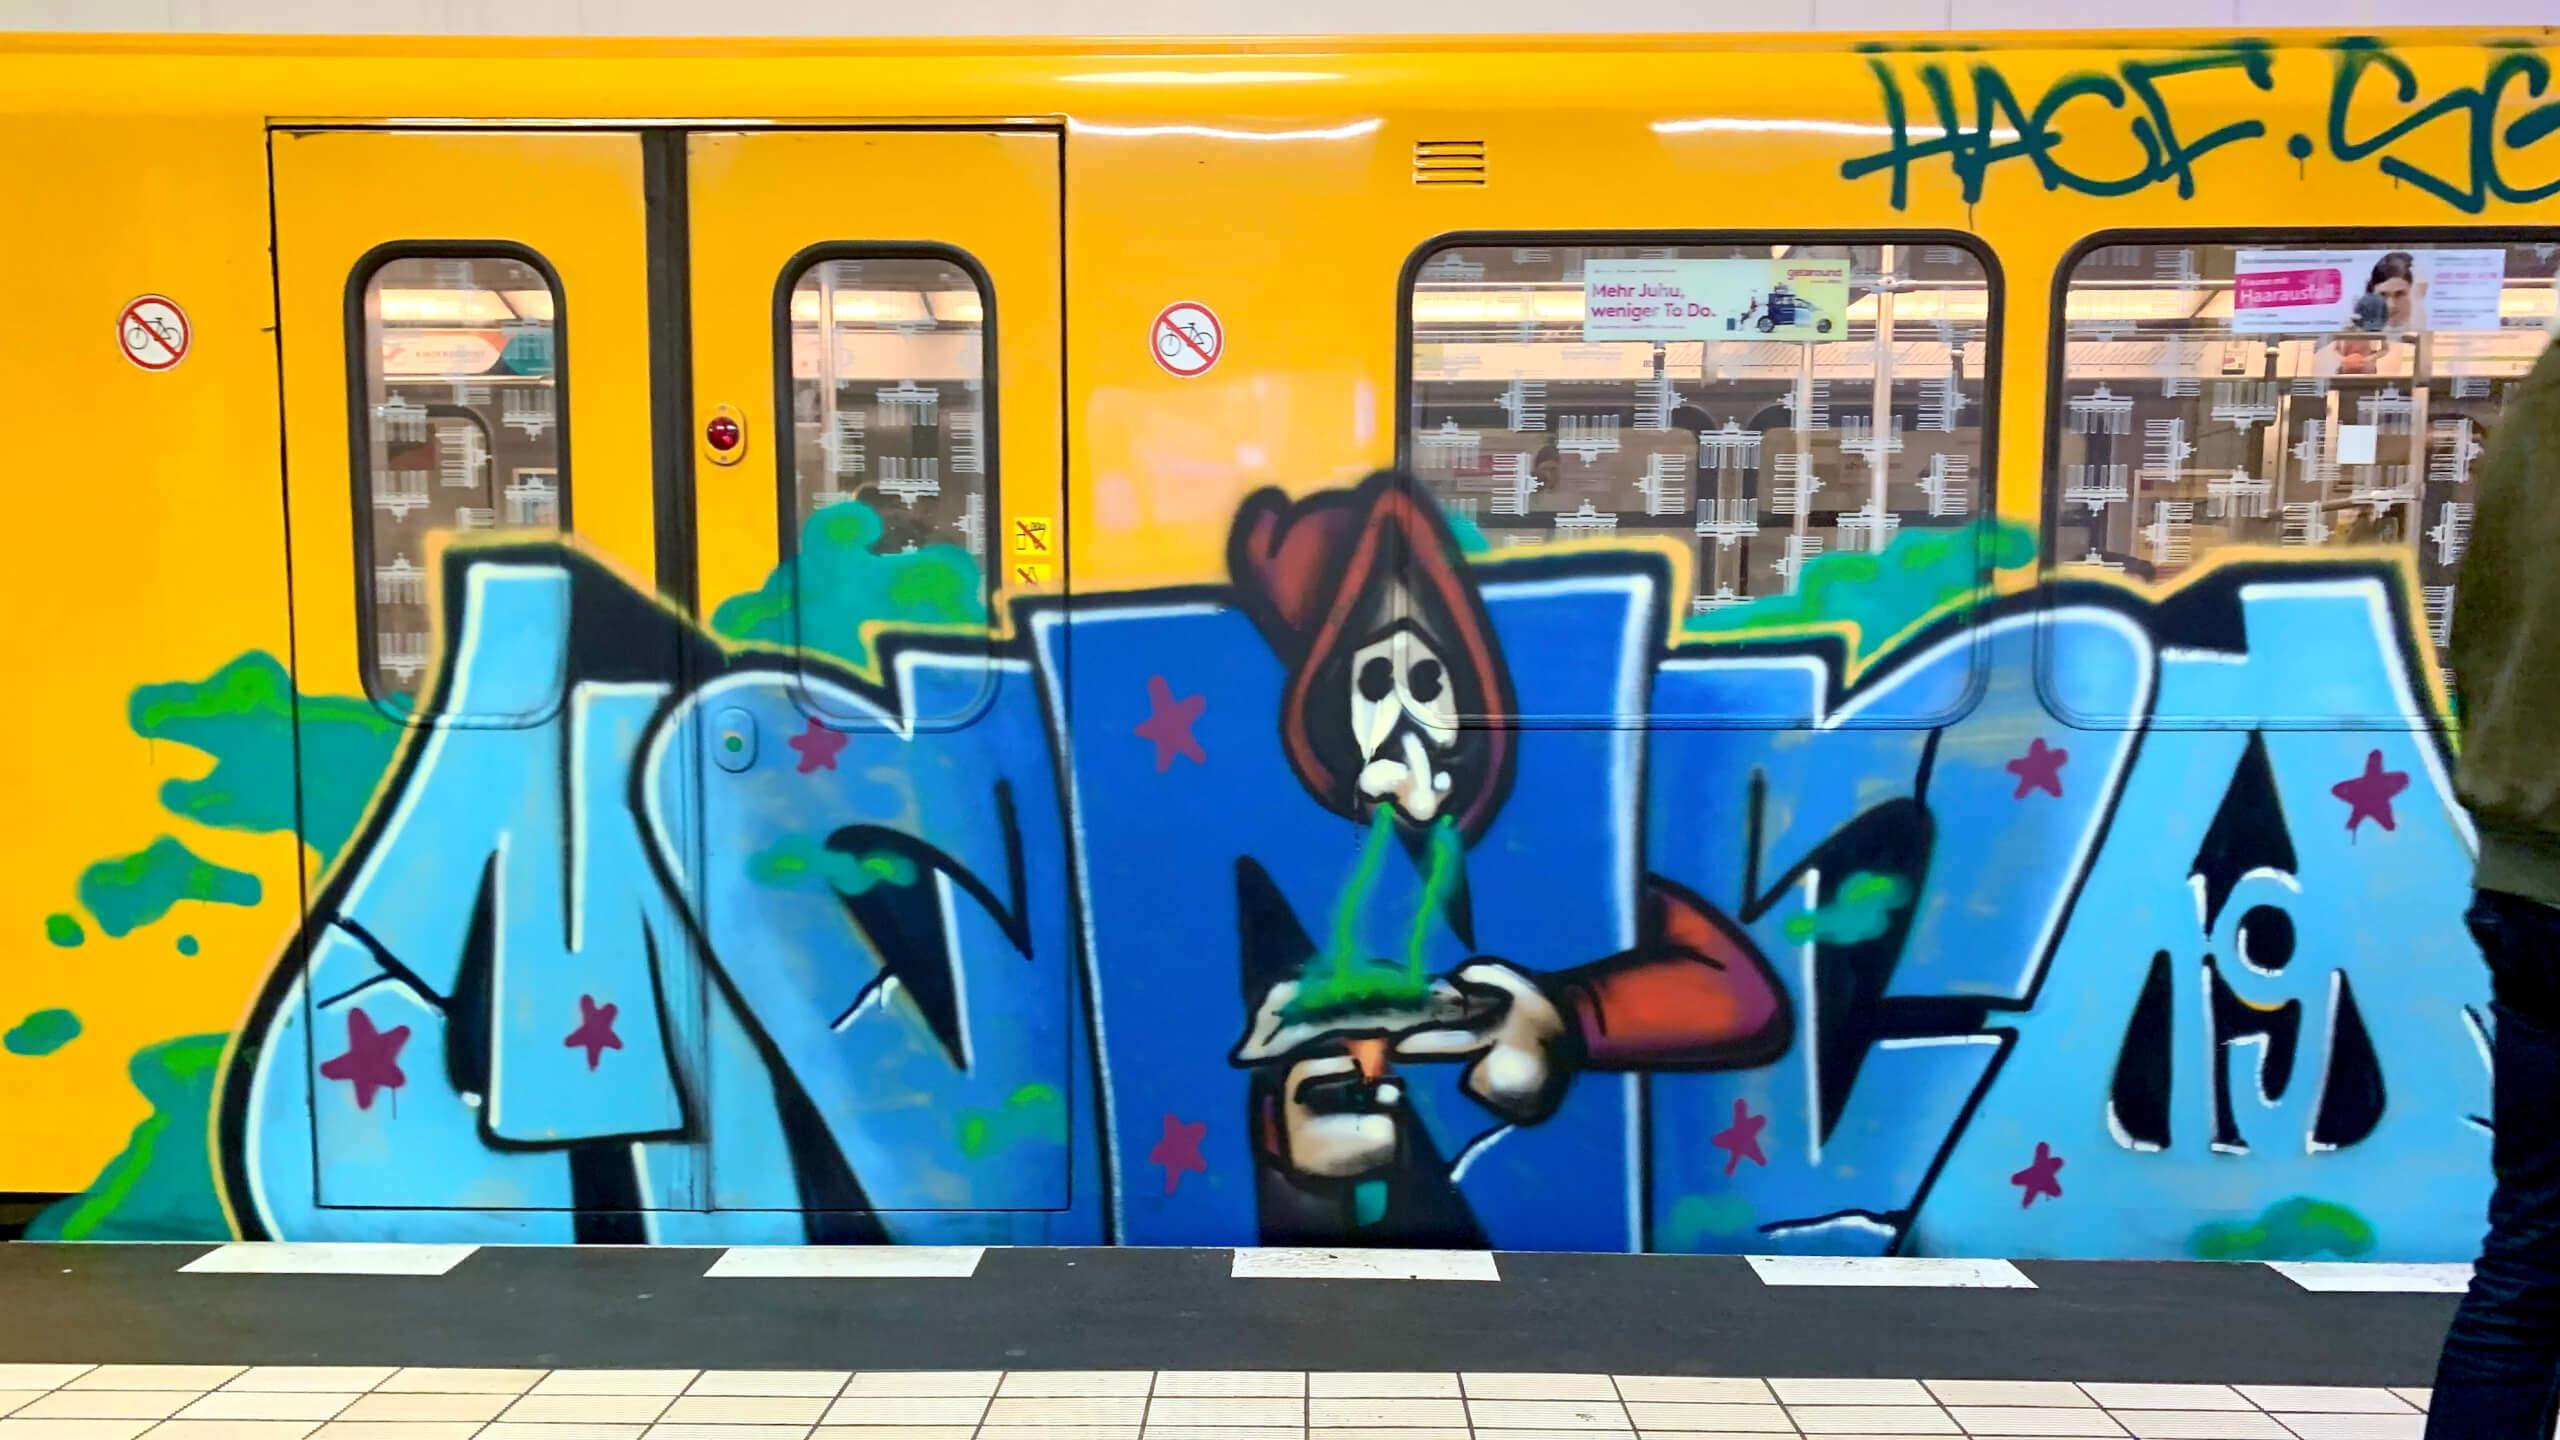 bekky bekks blog trainwriting02